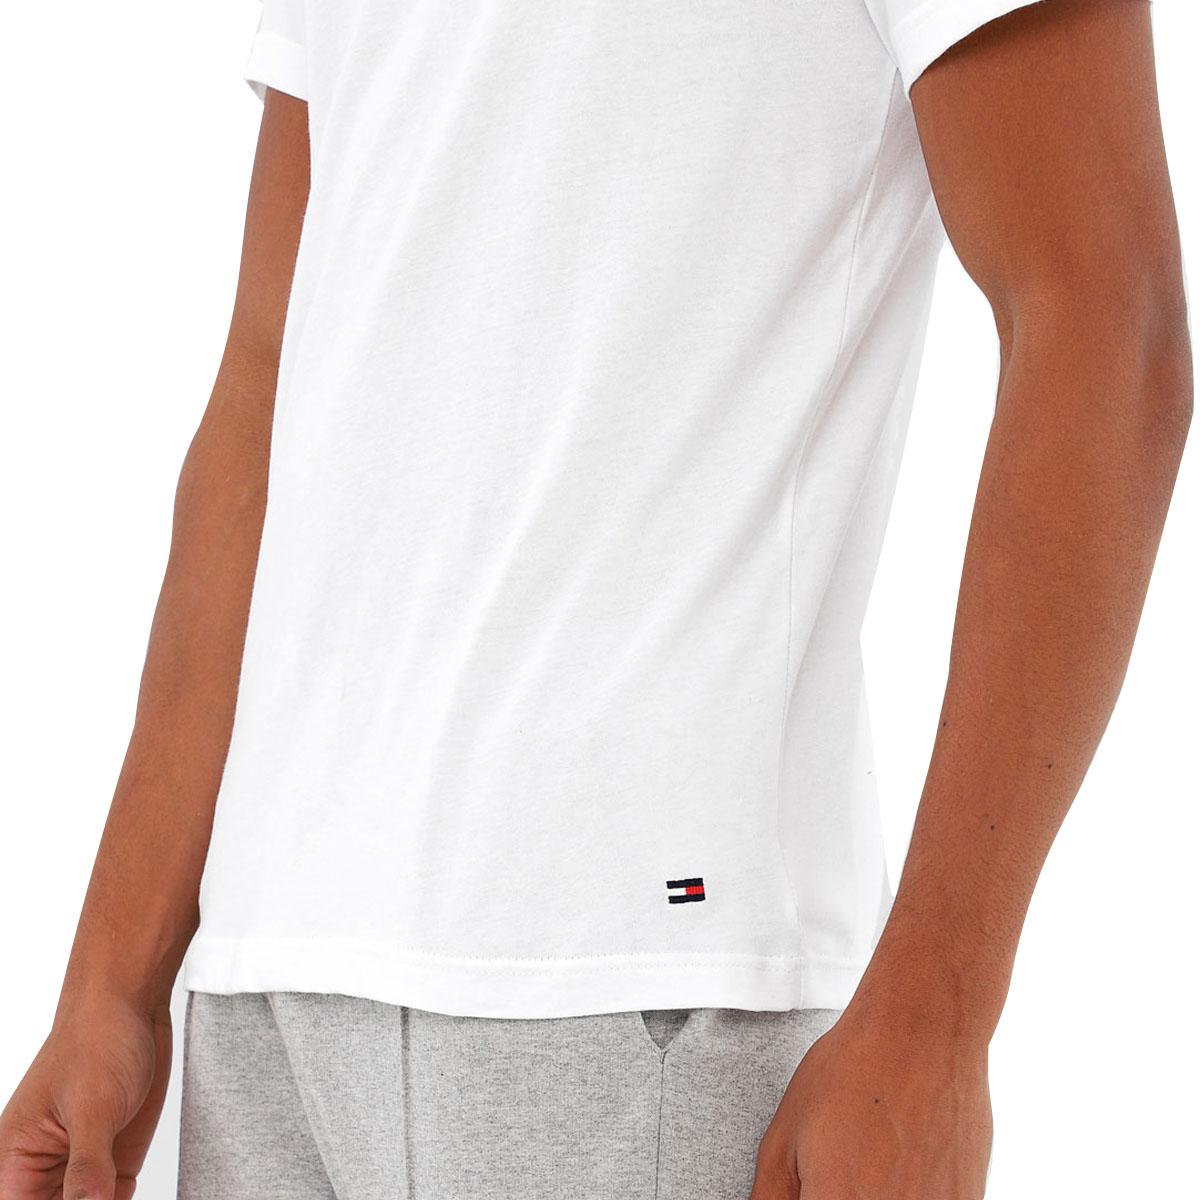 Kit 3 Camisetas Masculinas Tommy Hilfiger